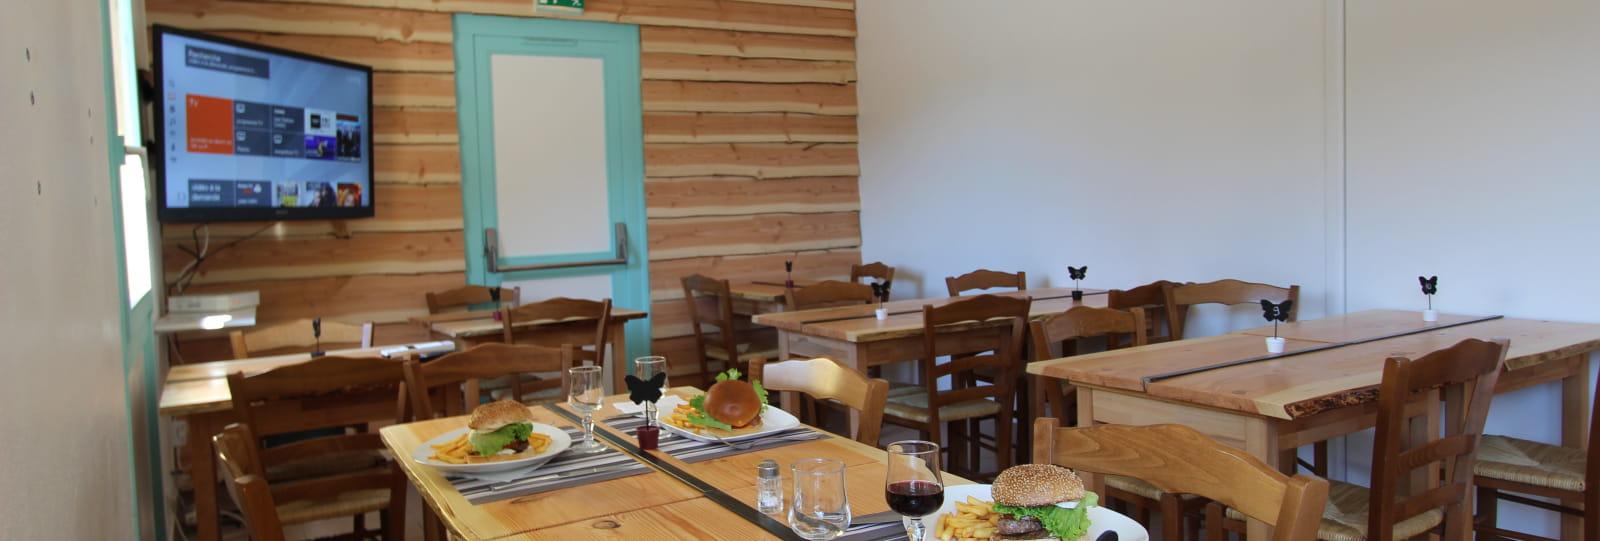 Restaurant Chanteduc